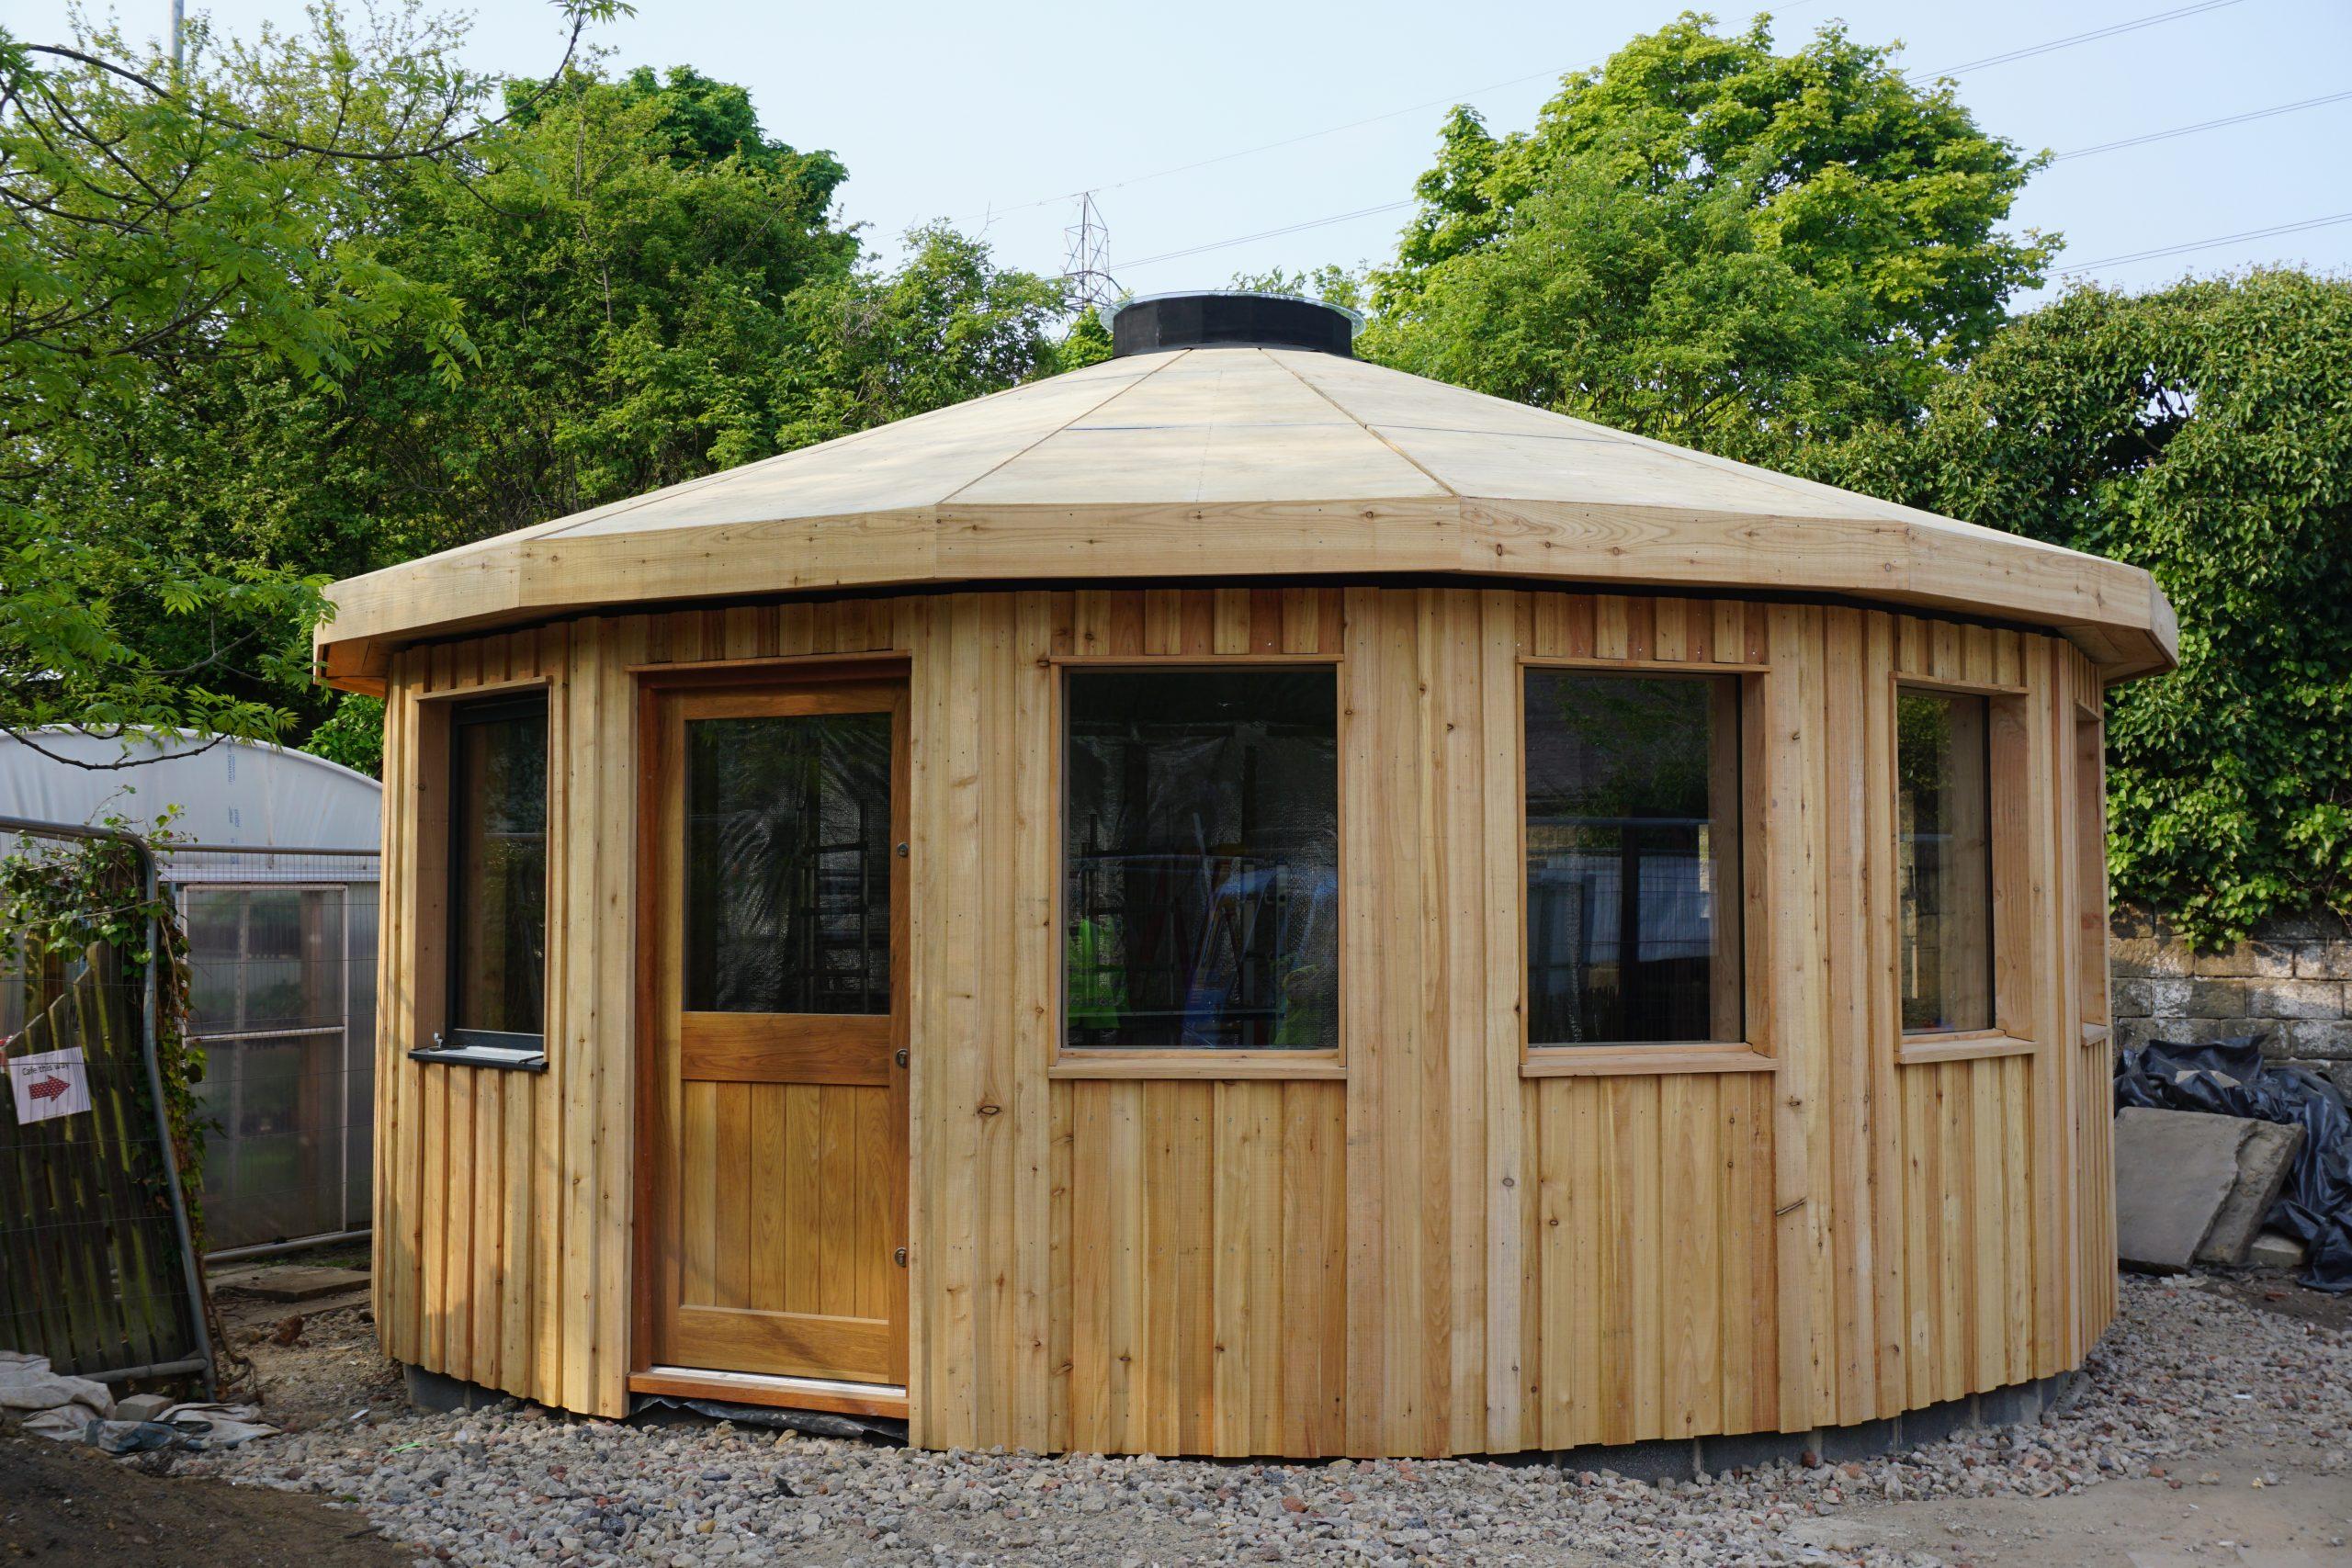 Roundhouse Classroom